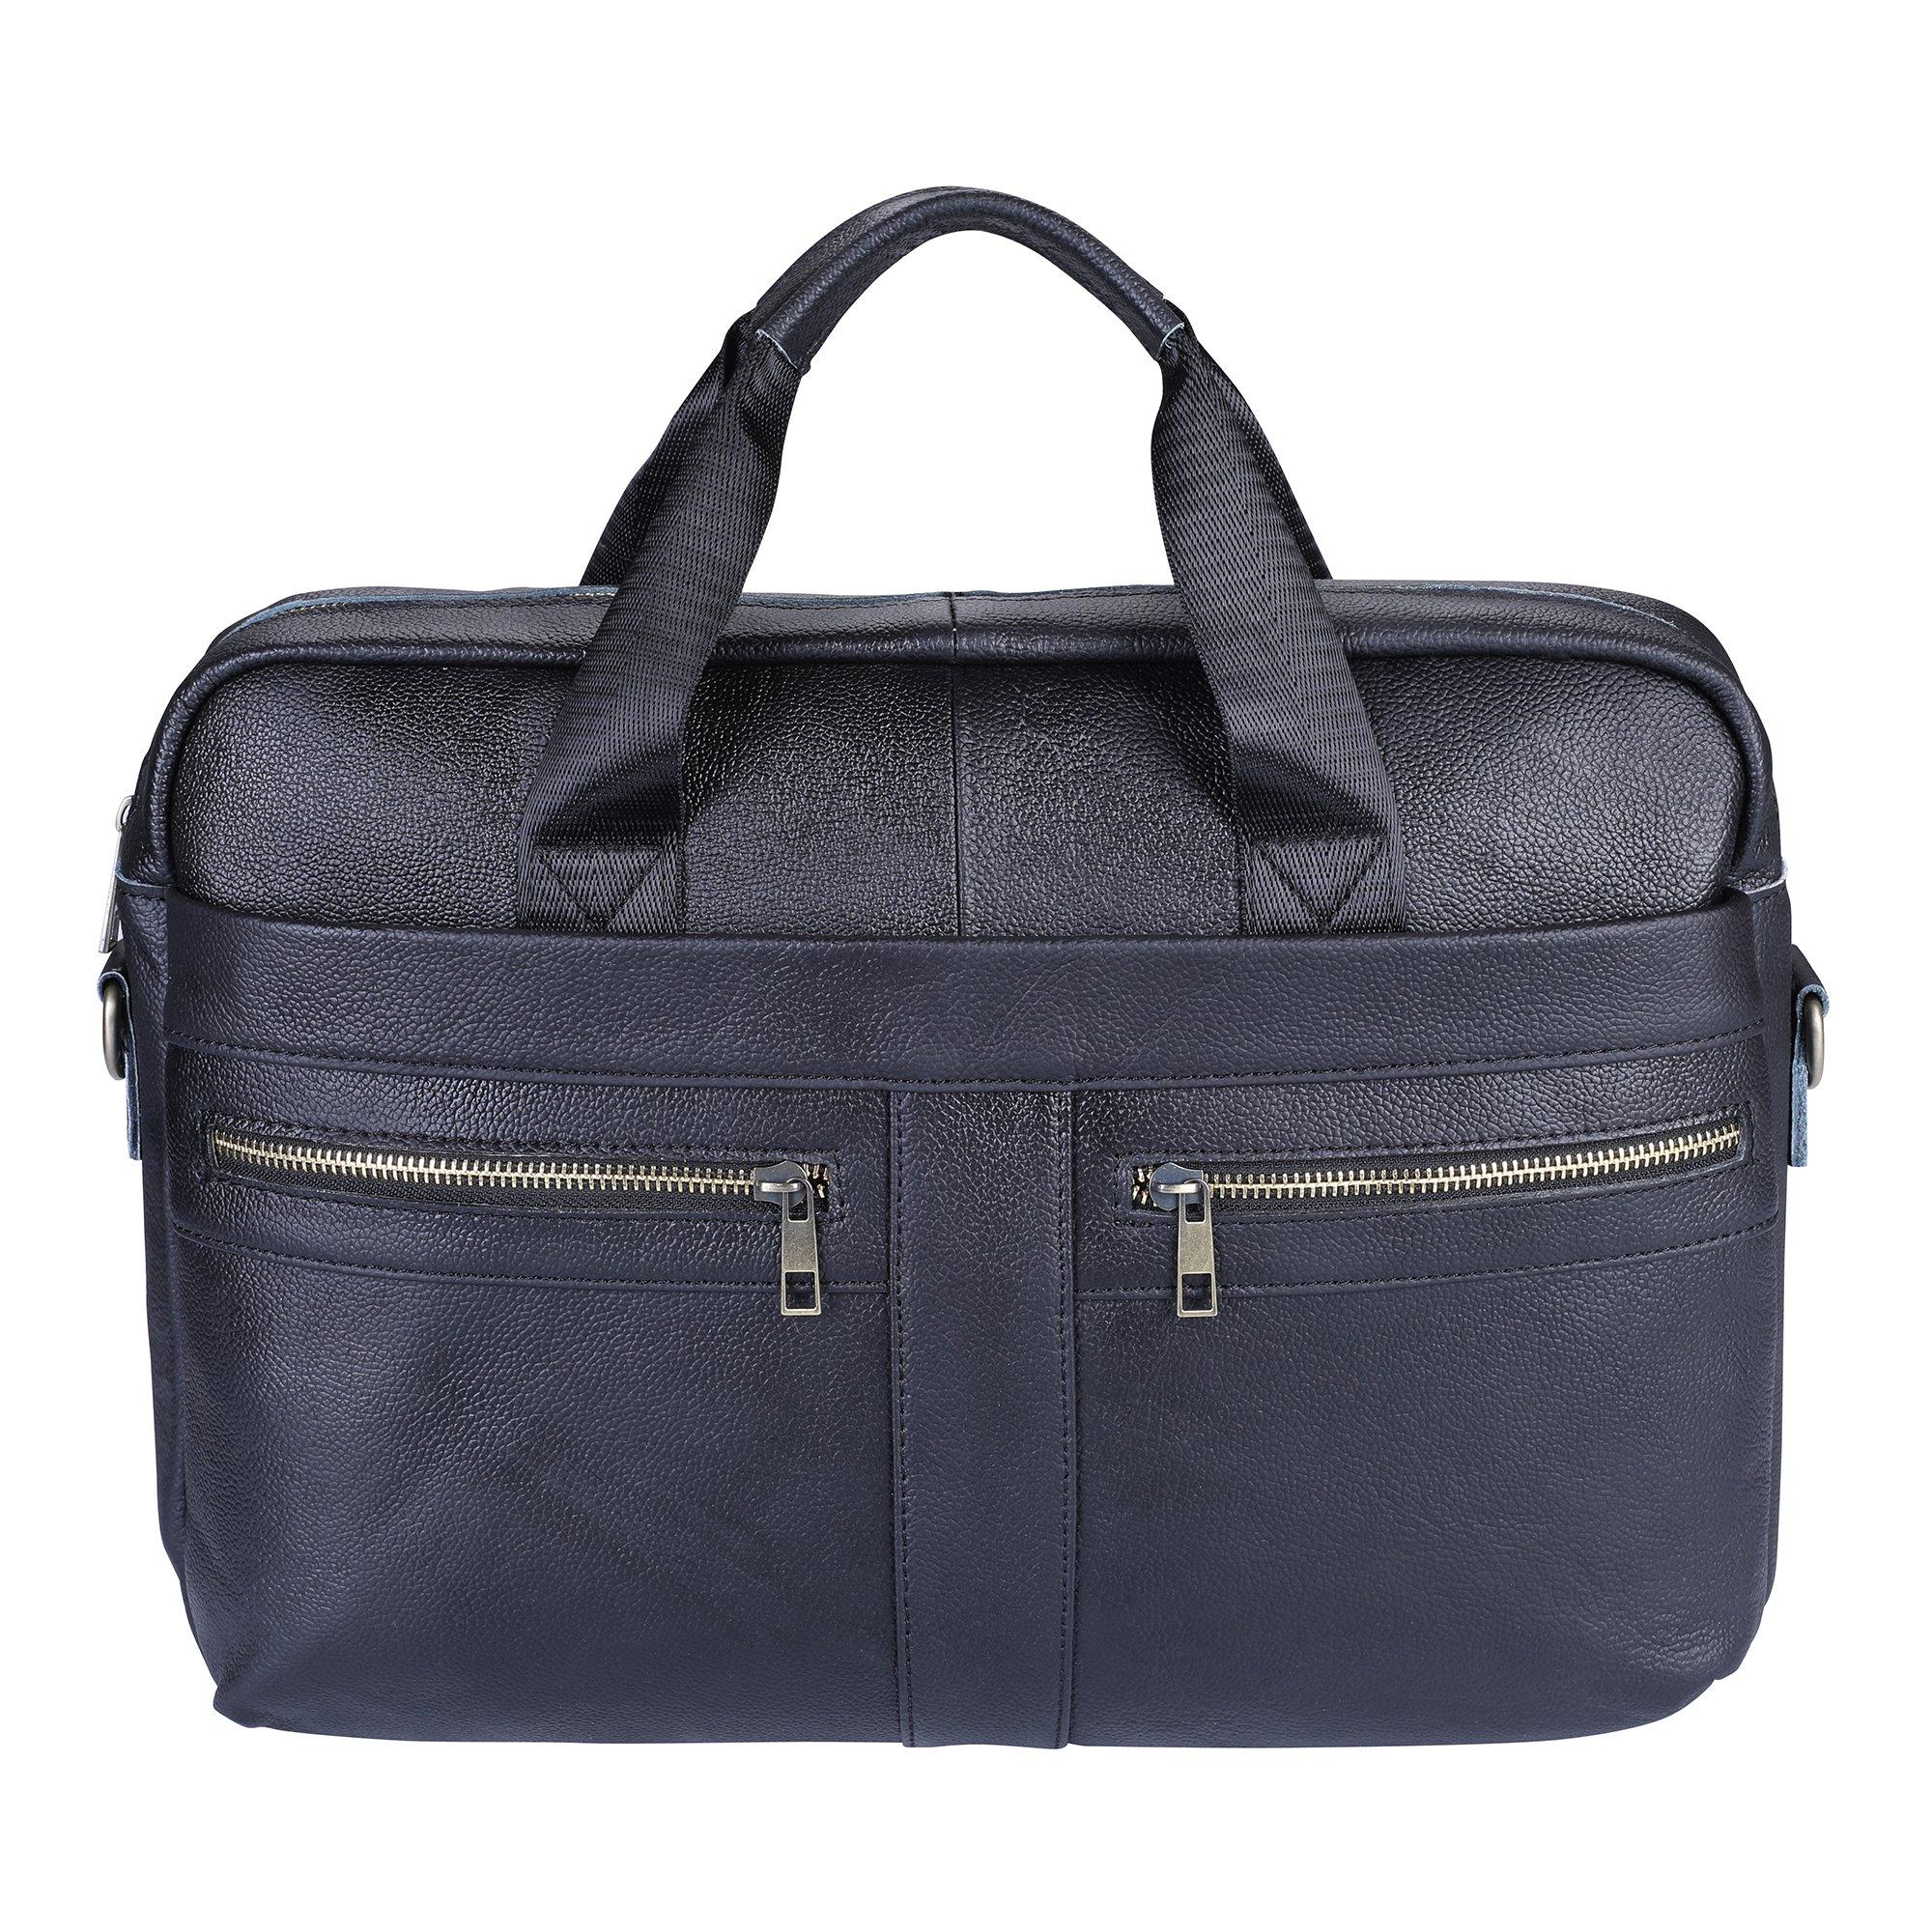 Men's Briefcase TECOOL Genuine Leather Laptop Business Shoulder Bag